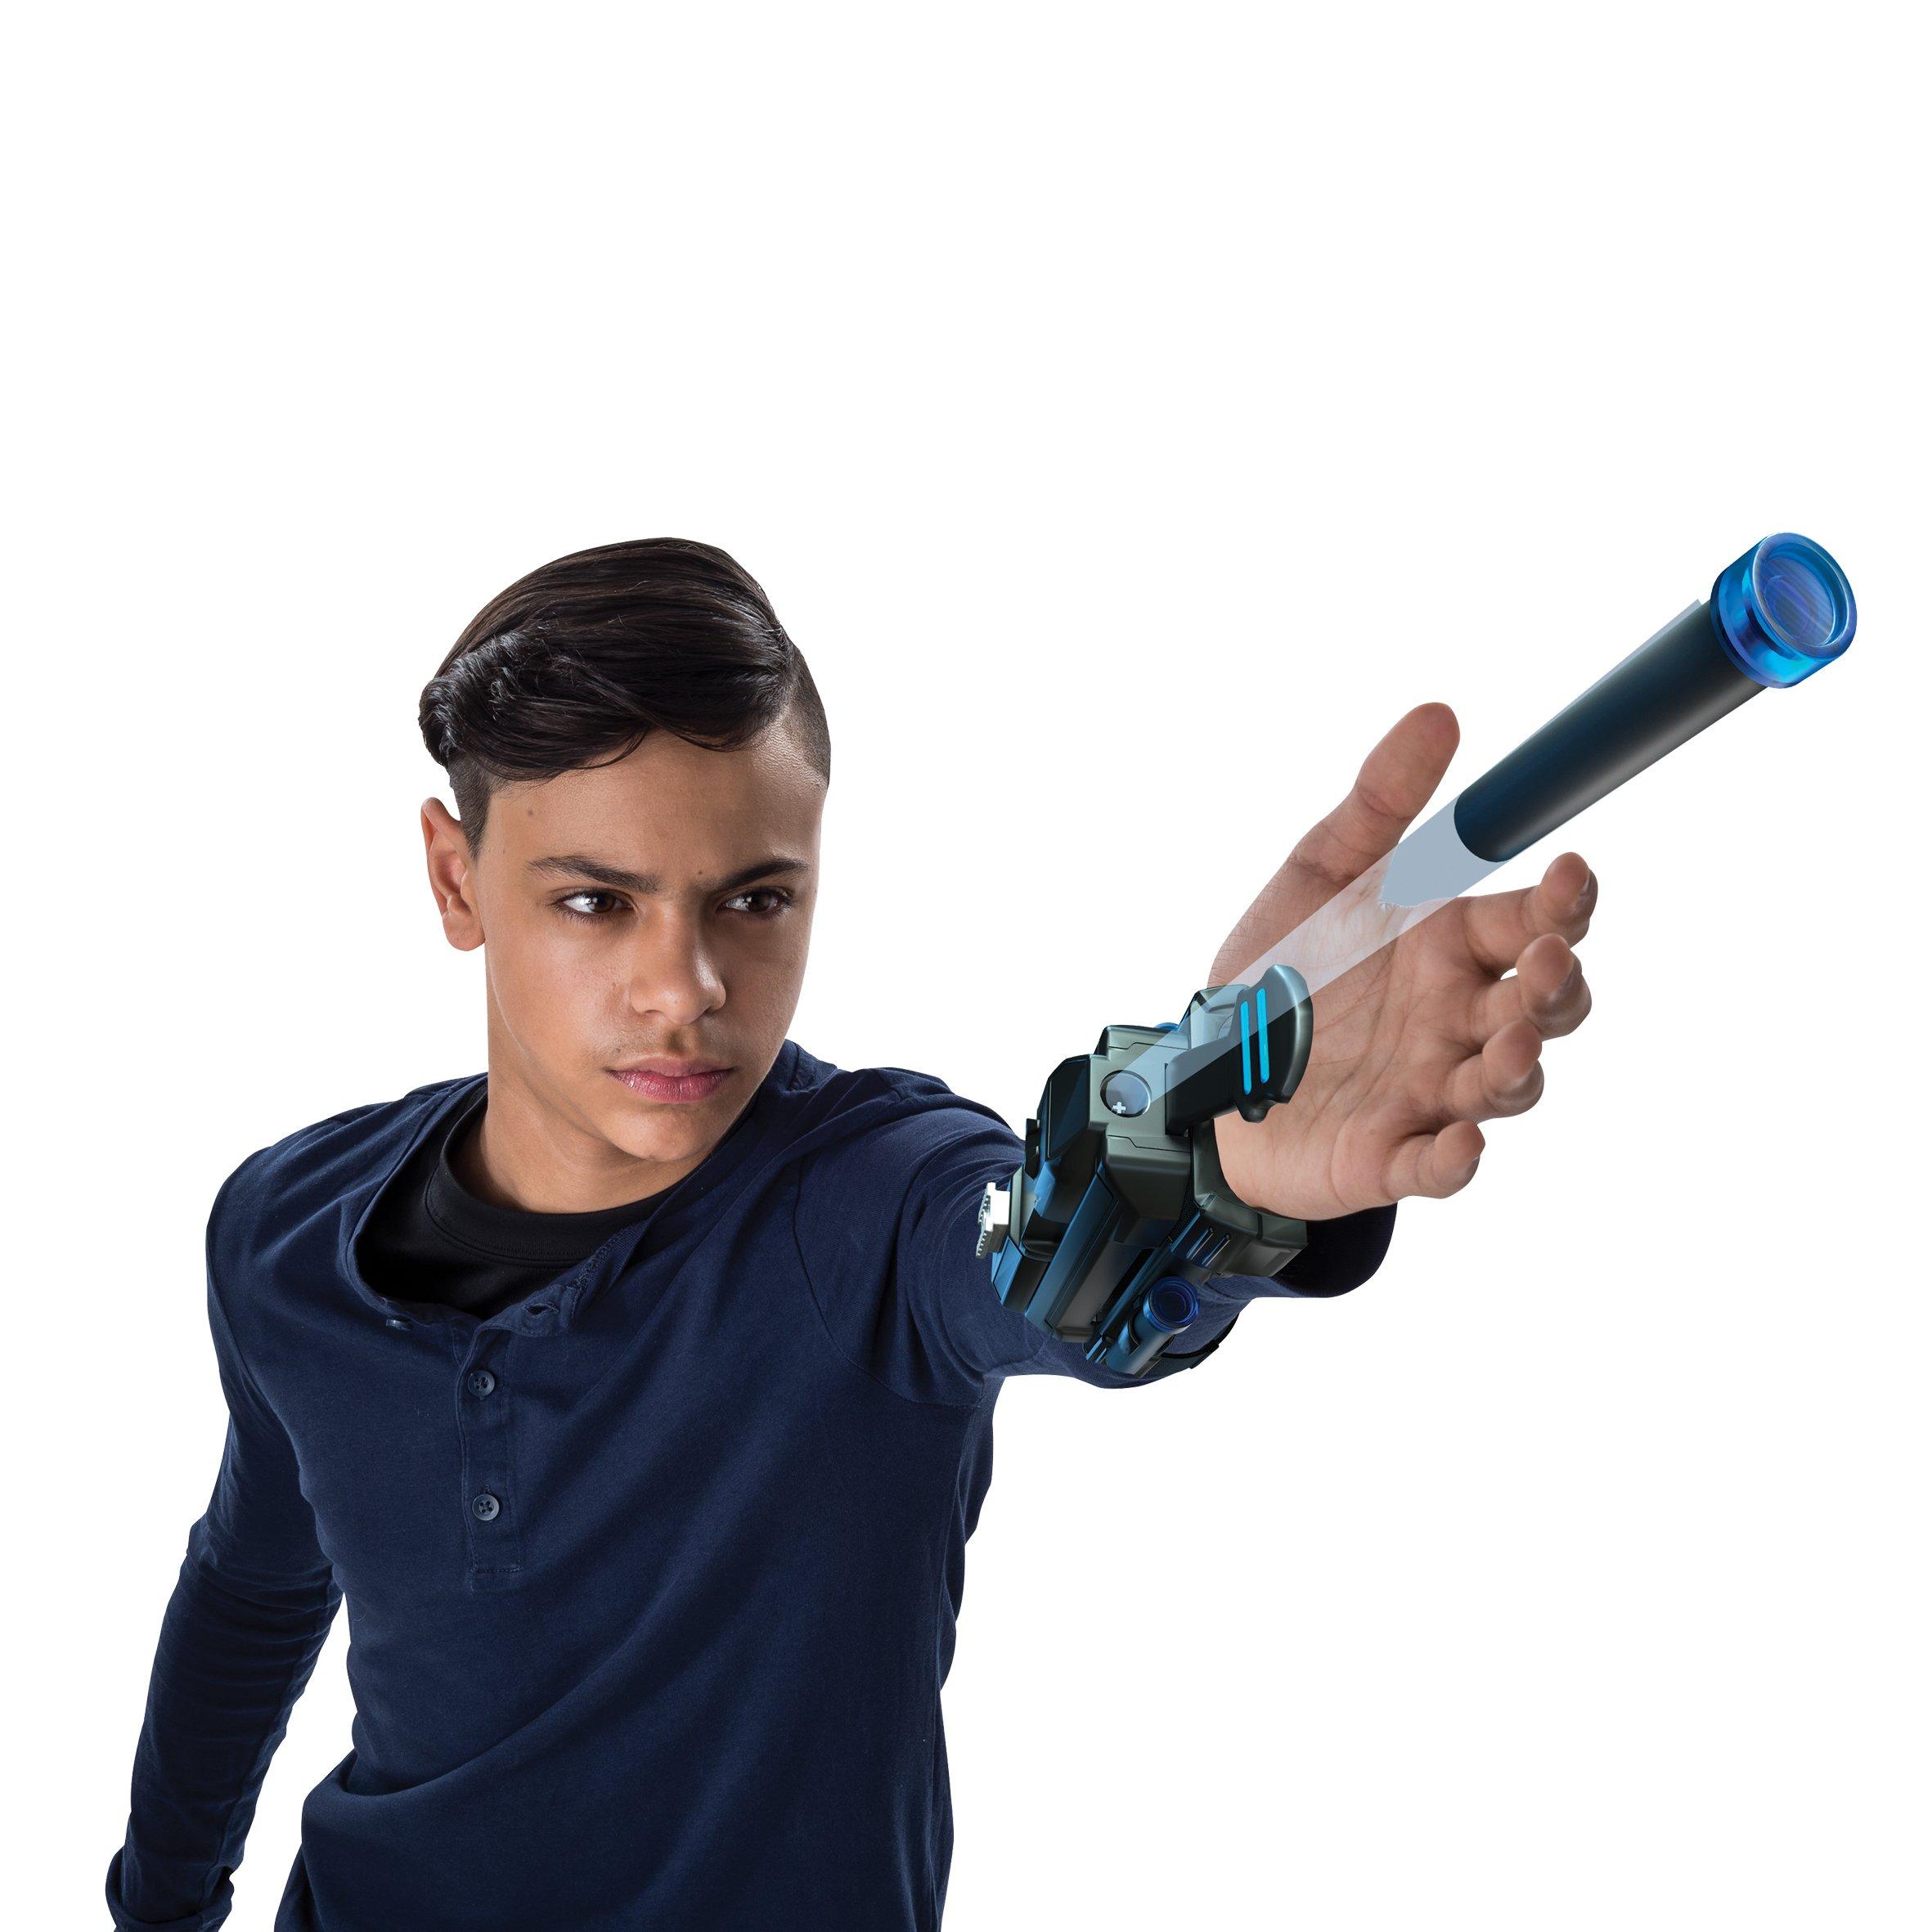 Spy Gear 6033009 Ninja Wrist Blaster by Spy Gear (Image #5)